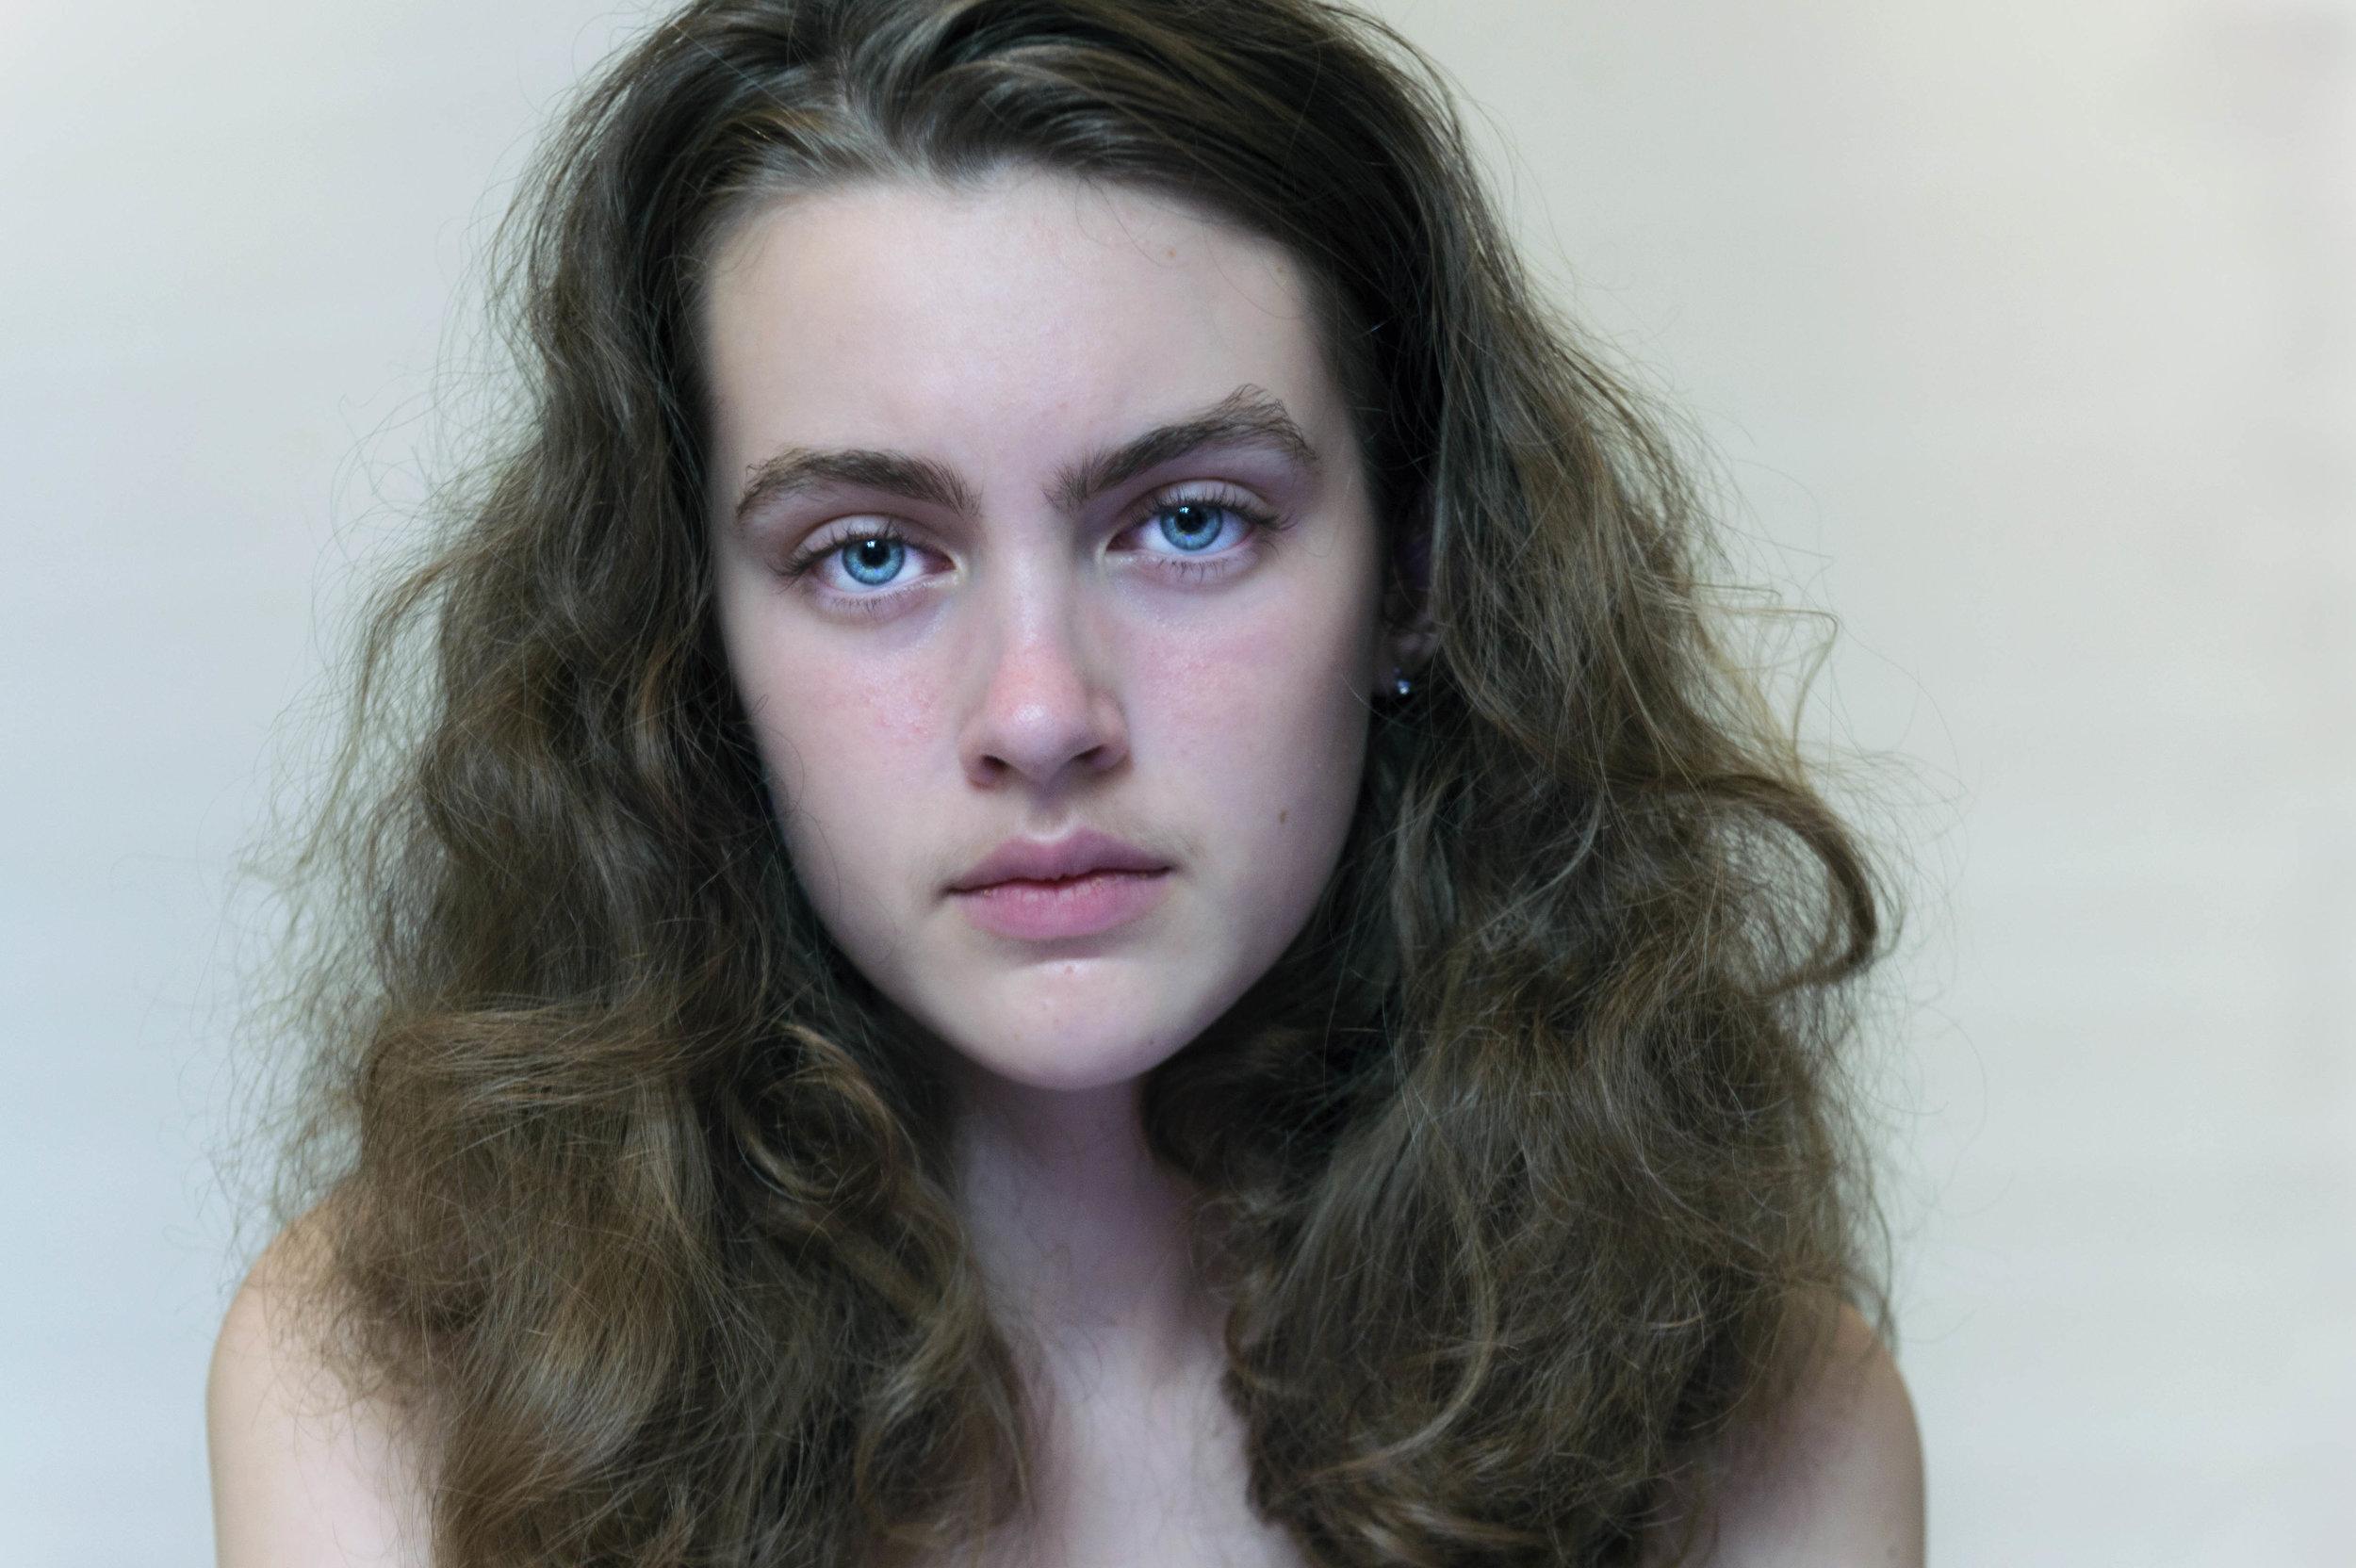 Zorica Purlija, Complicated, 2018, Baryta fine art photo rag.